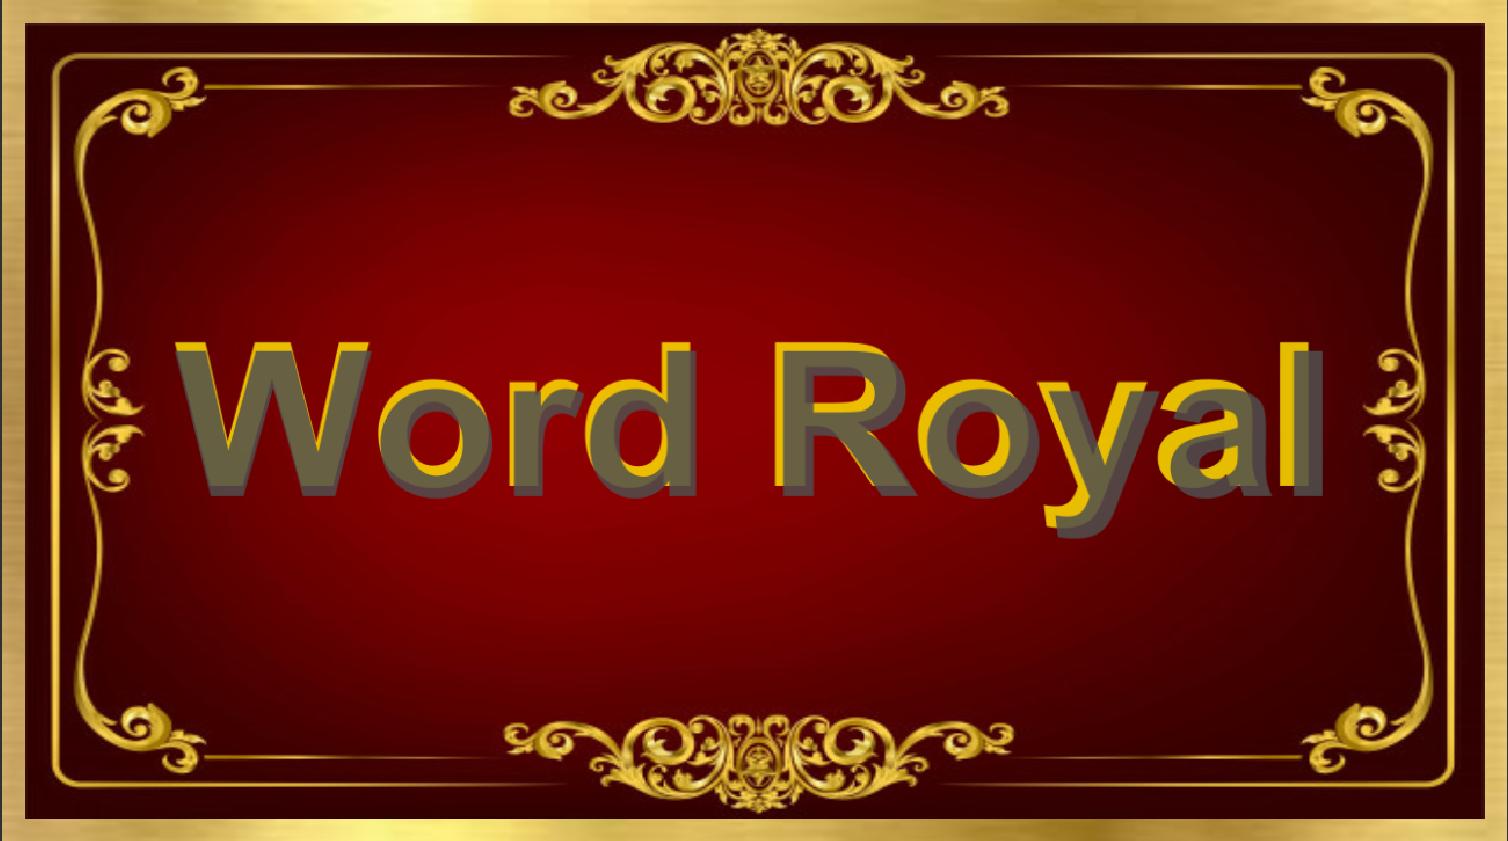 Word Royal